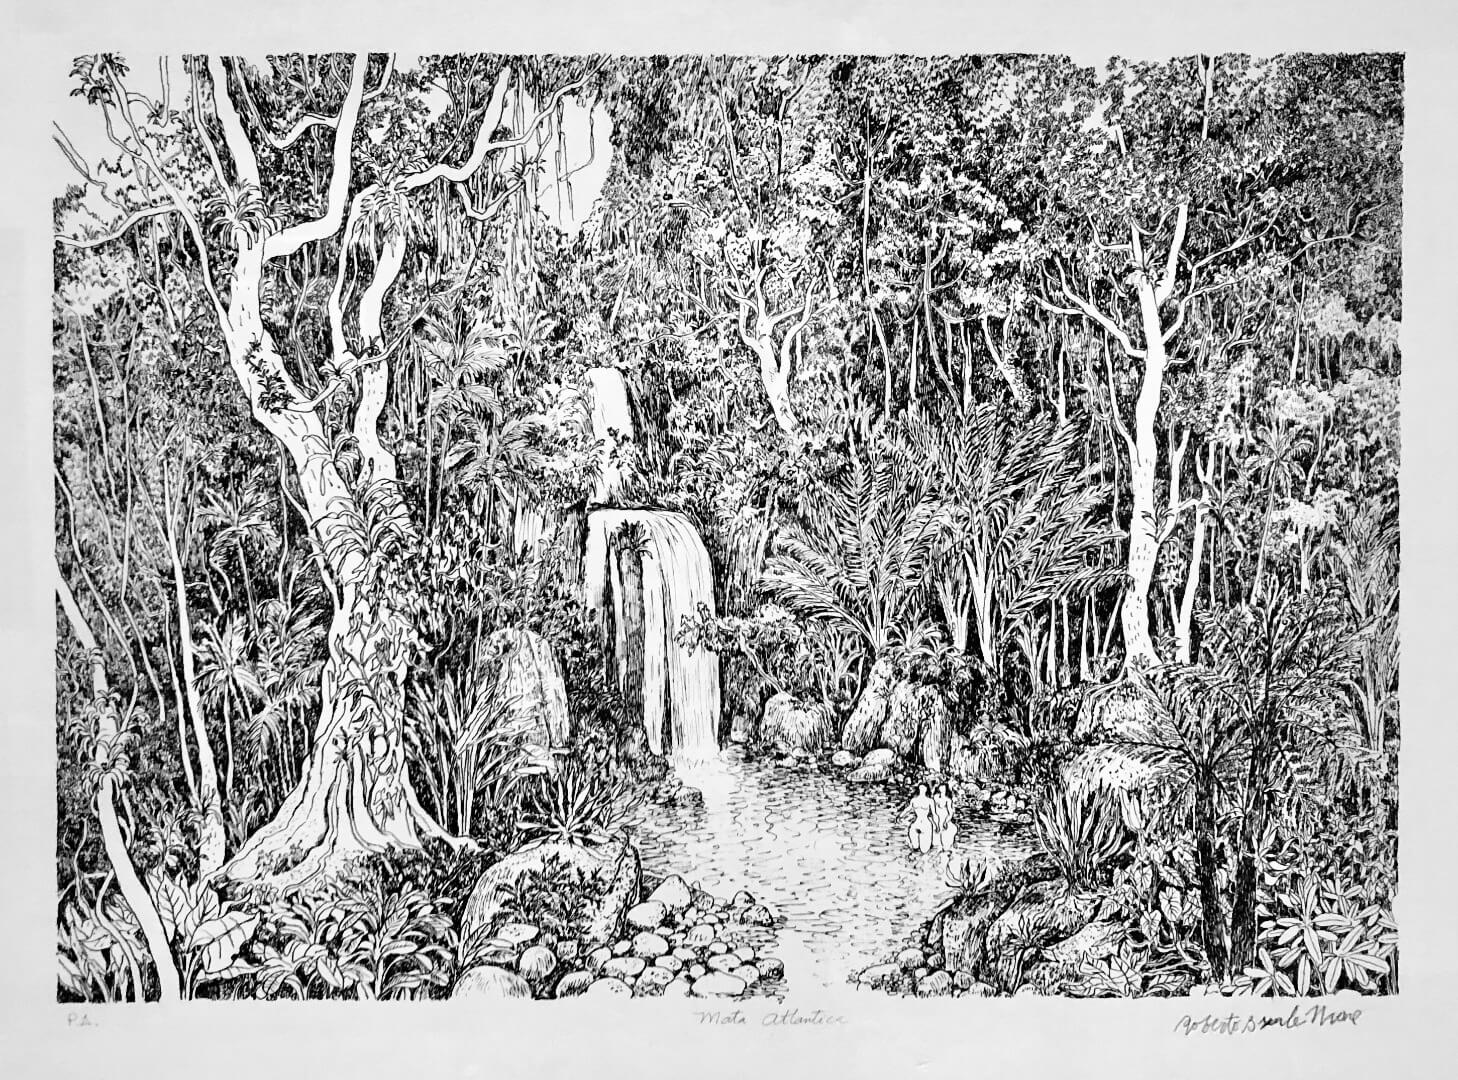 6_Roberto Burle Marx, Mata Atlantca, 1991, Litograph on paper